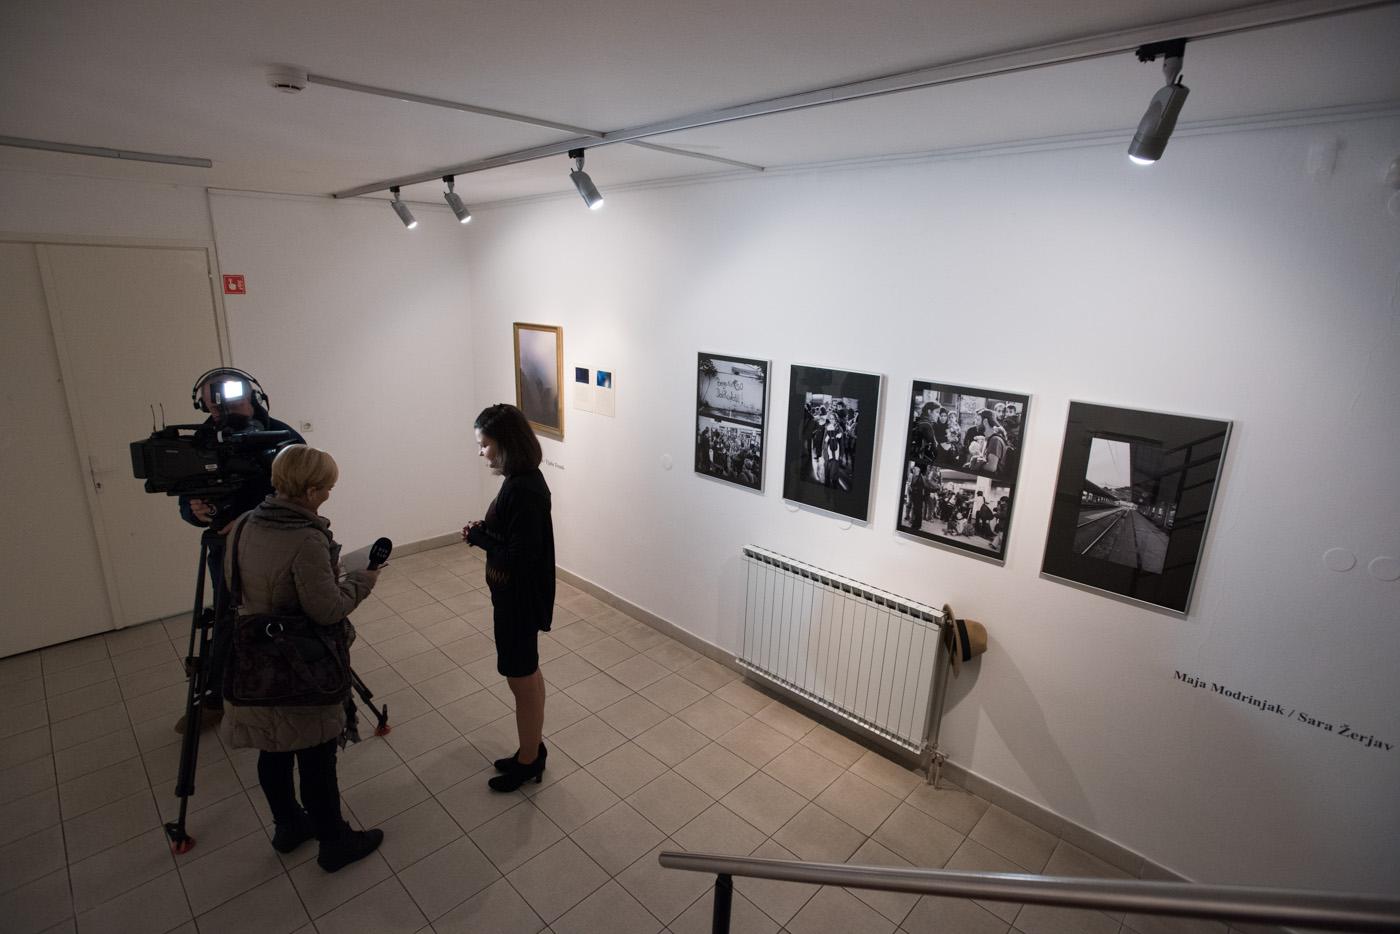 fotograf in kustus-MediaNox-Maribor-15.jpg